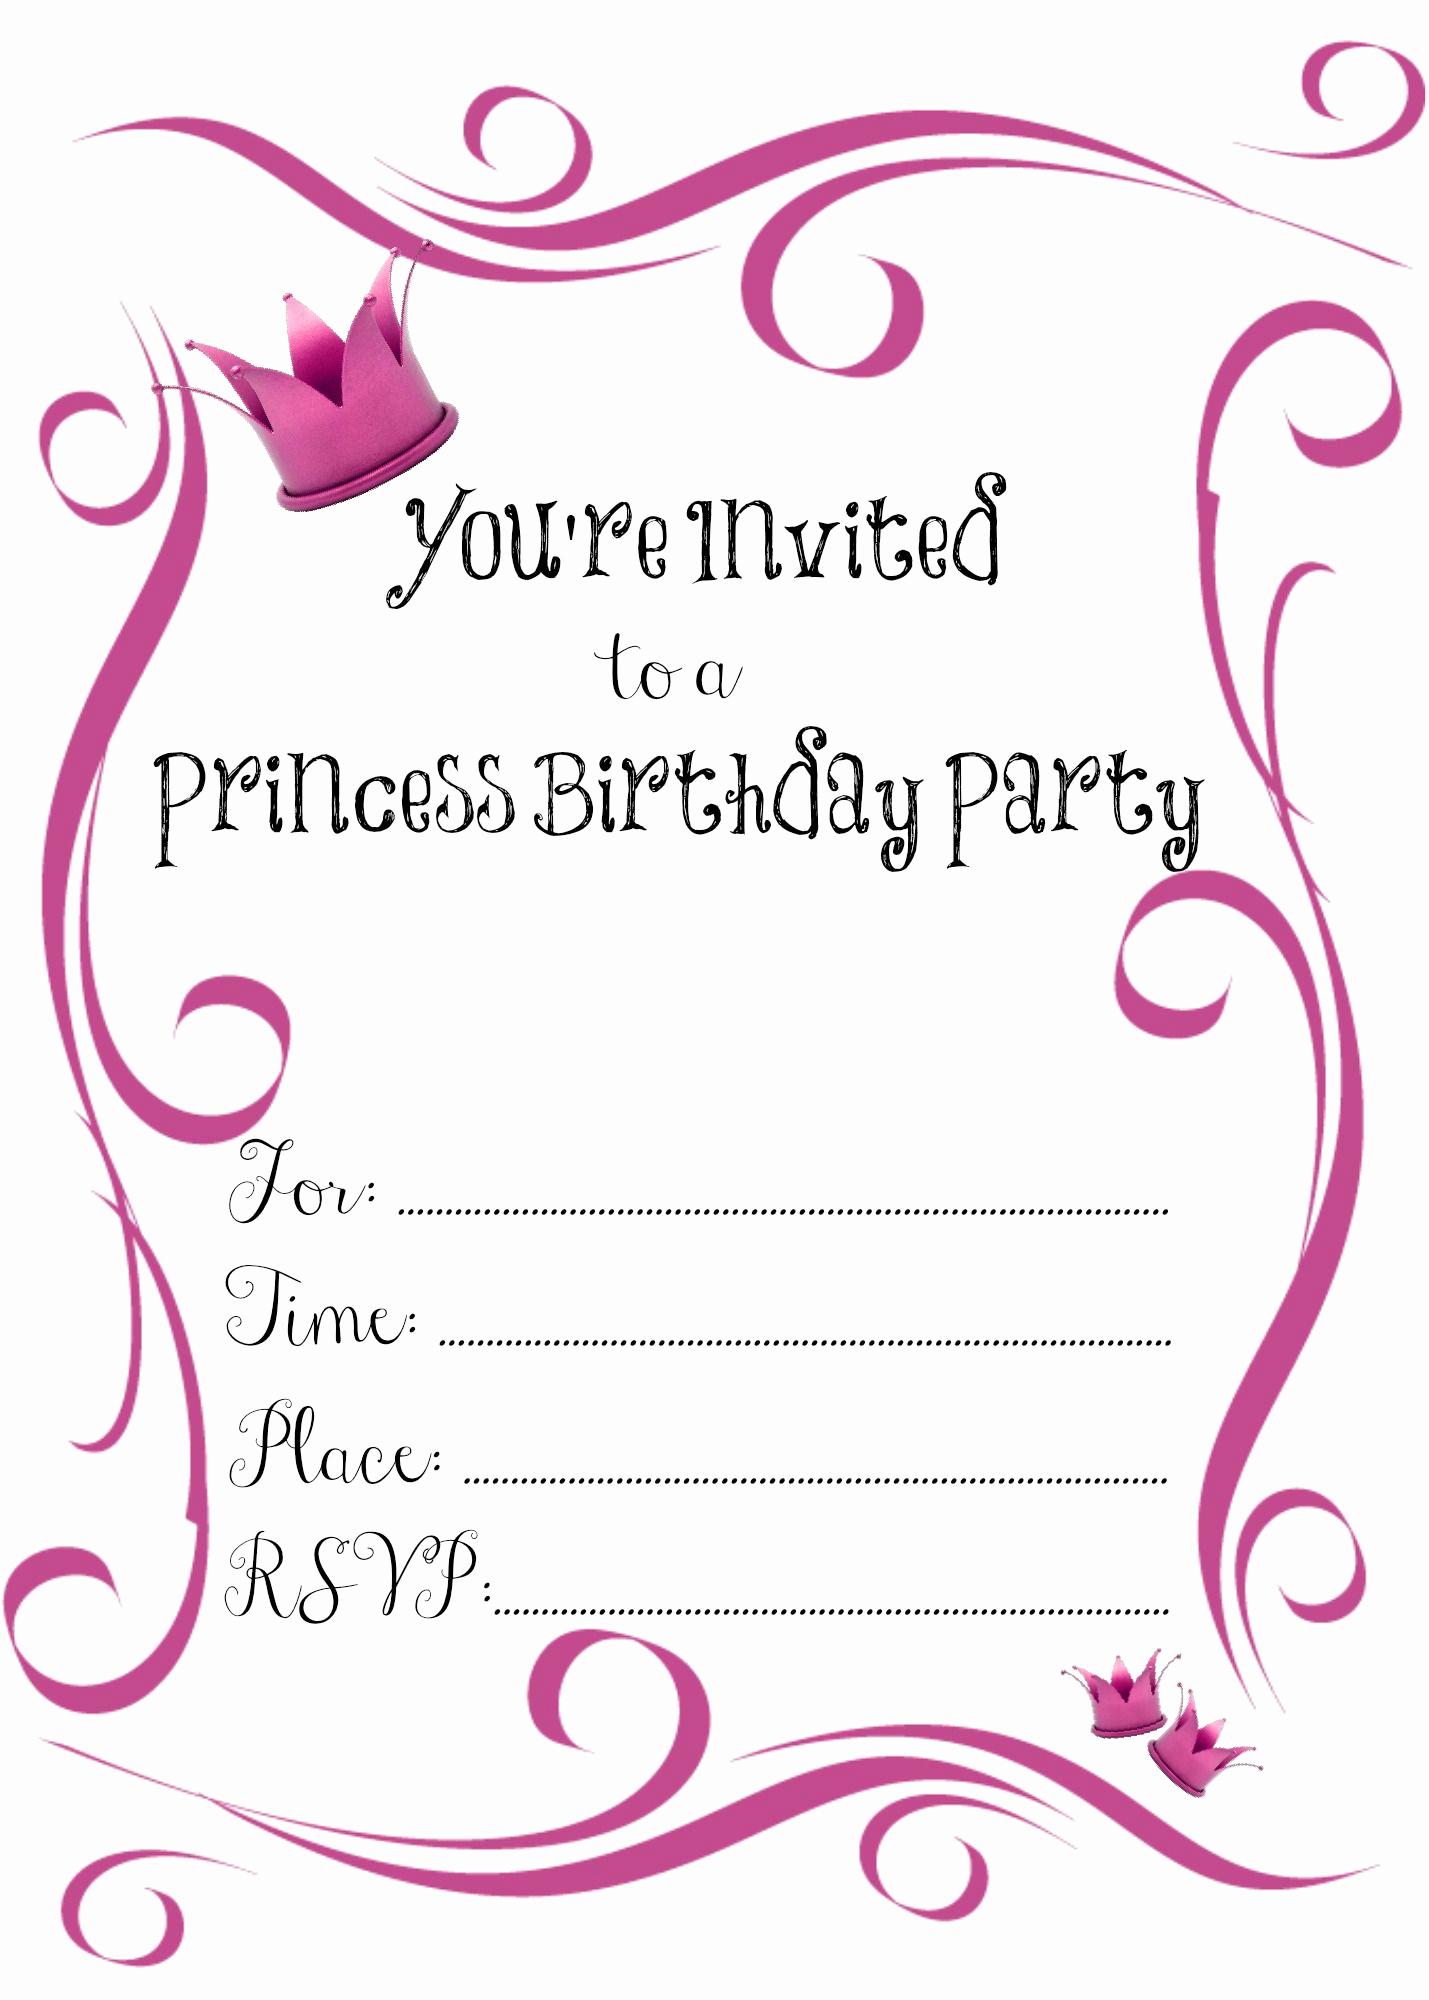 Free Birthday Party Invitation Template Elegant 21 Kids Birthday Invitation Wording that We Can Make